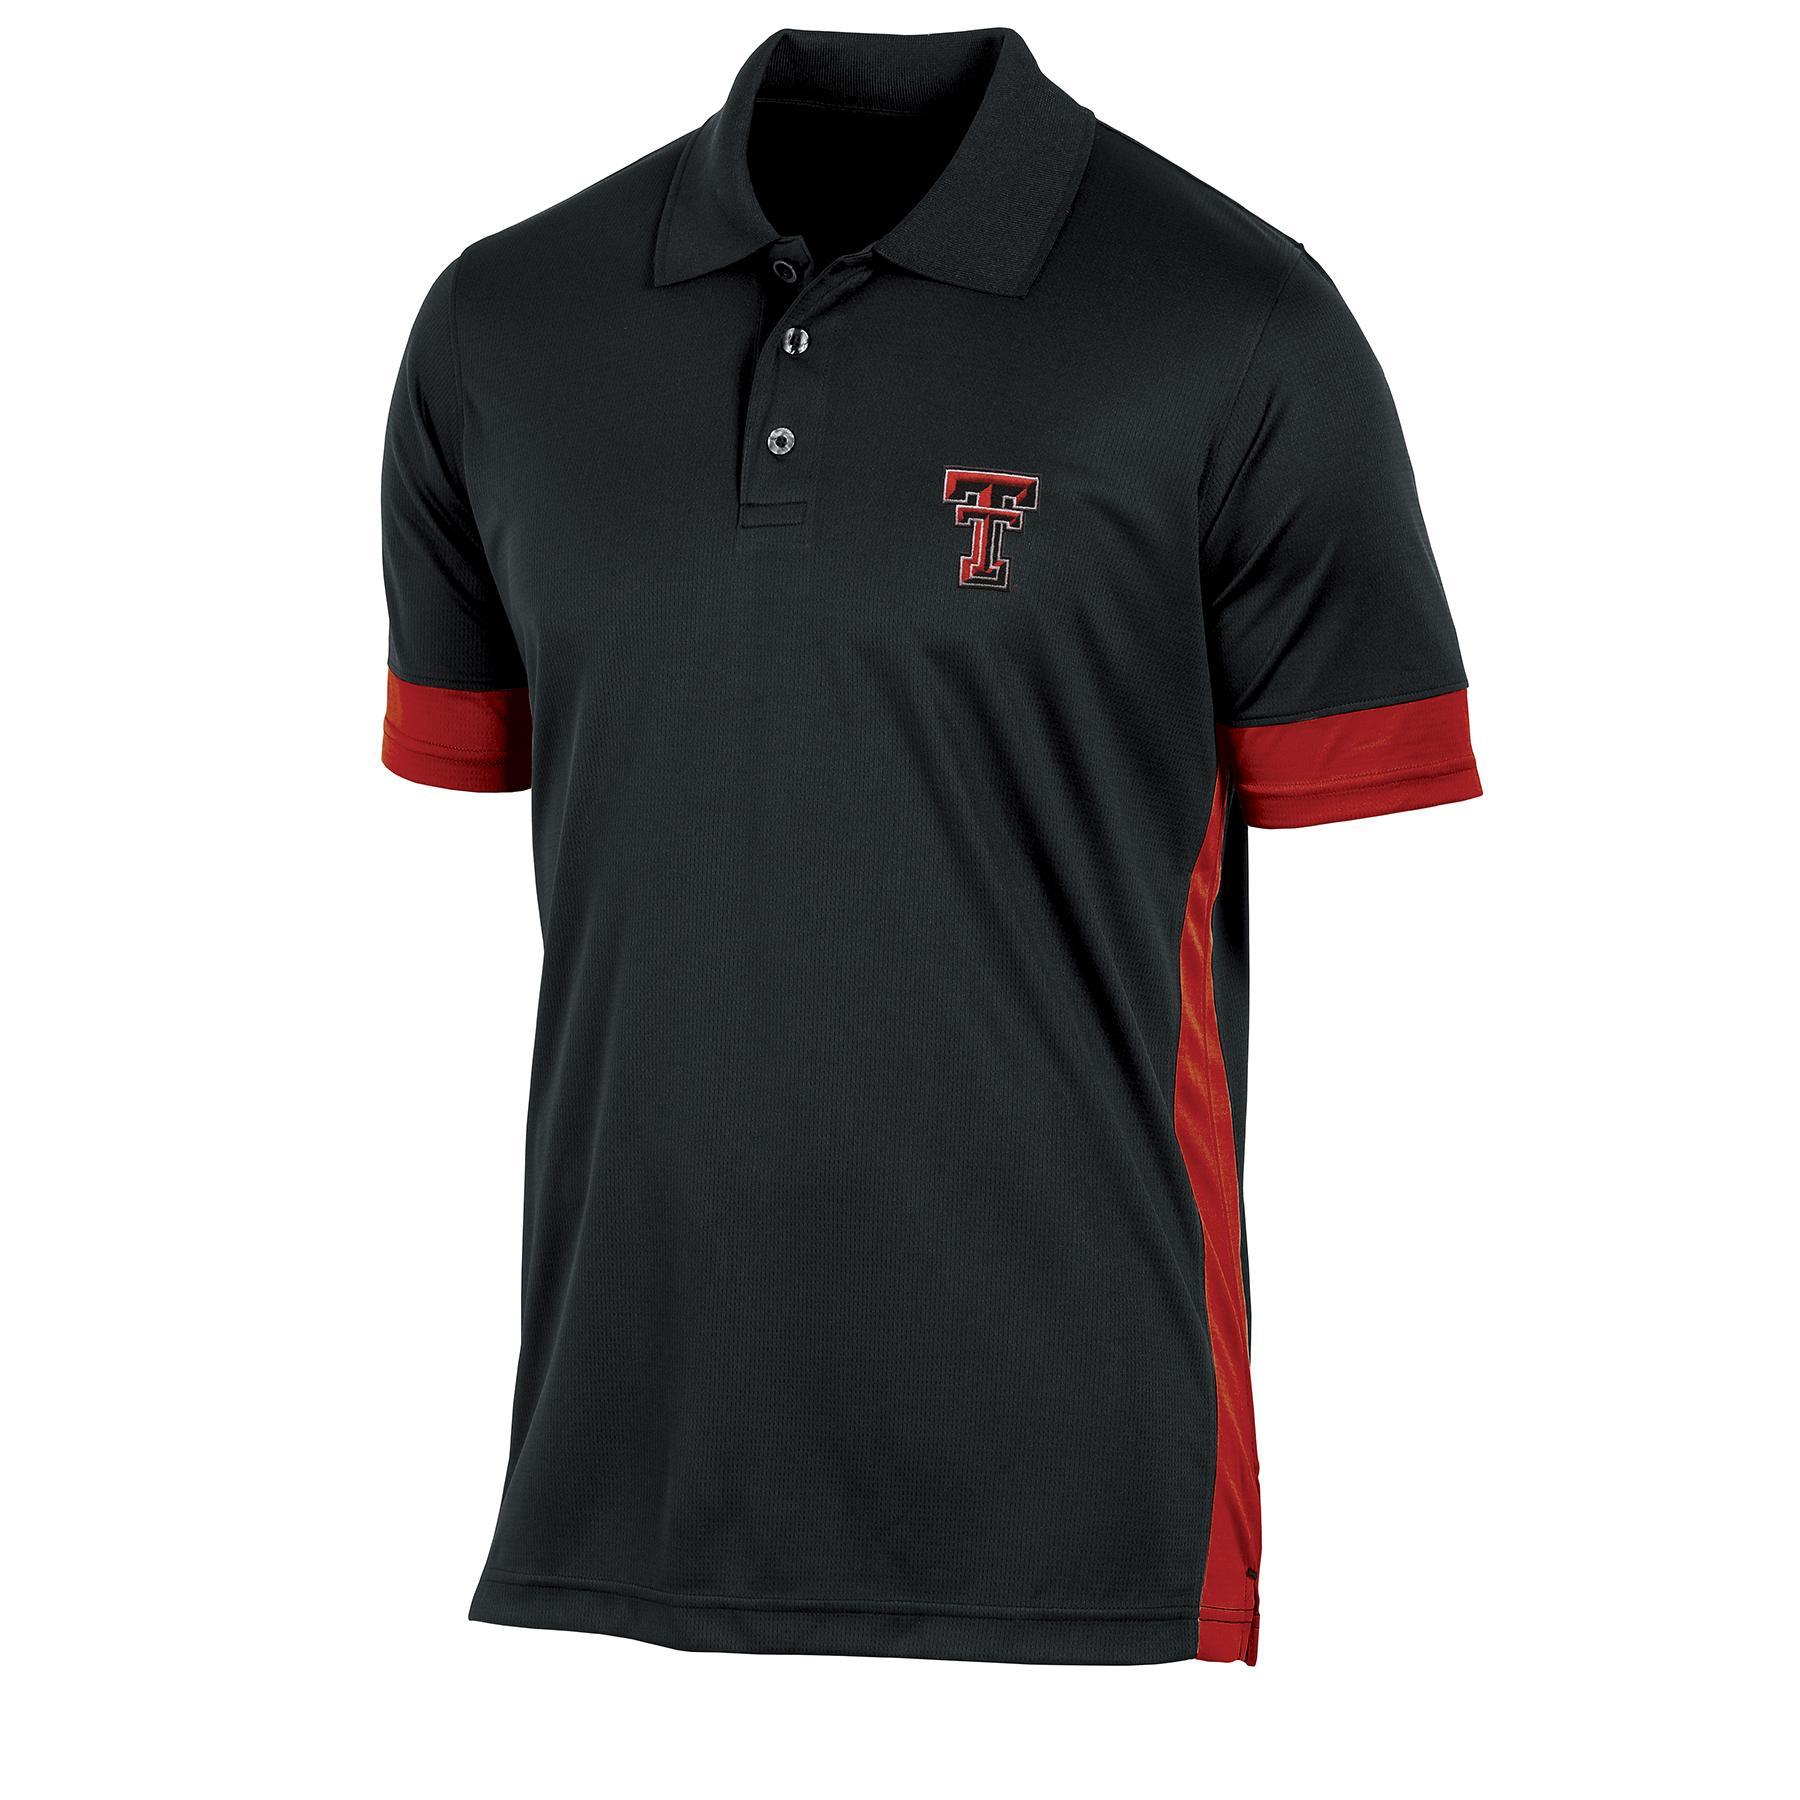 NCAA Men's Big & Tall Polo Shirt - Texas Tech Red Raiders PartNumber: 046VA94707212P MfgPartNumber: 7AXEE37KMF